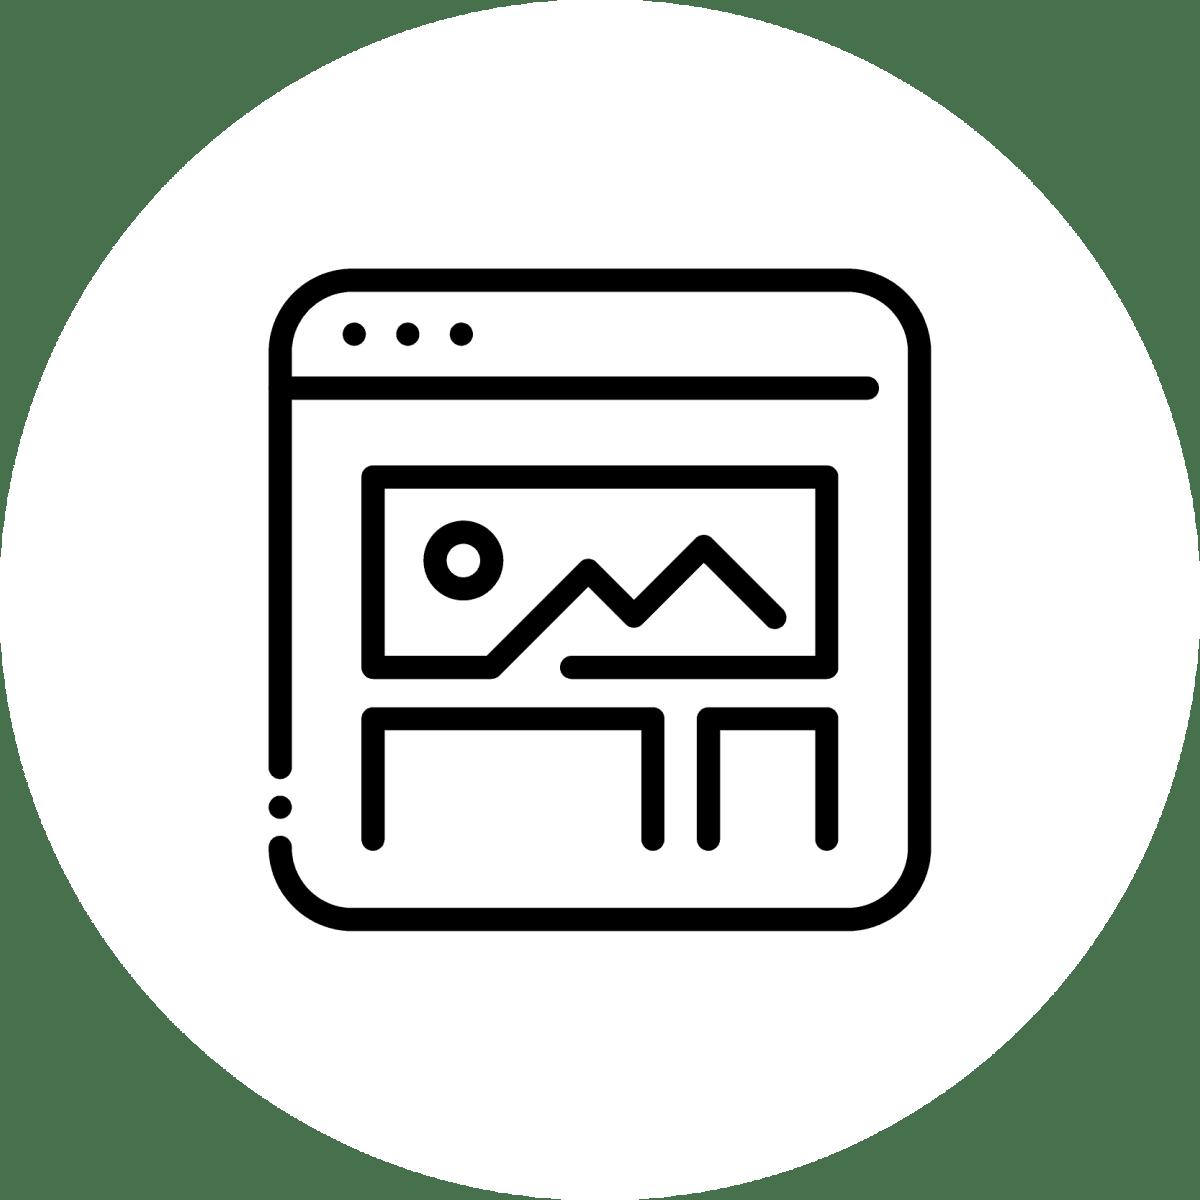 websitedesign_circle_white